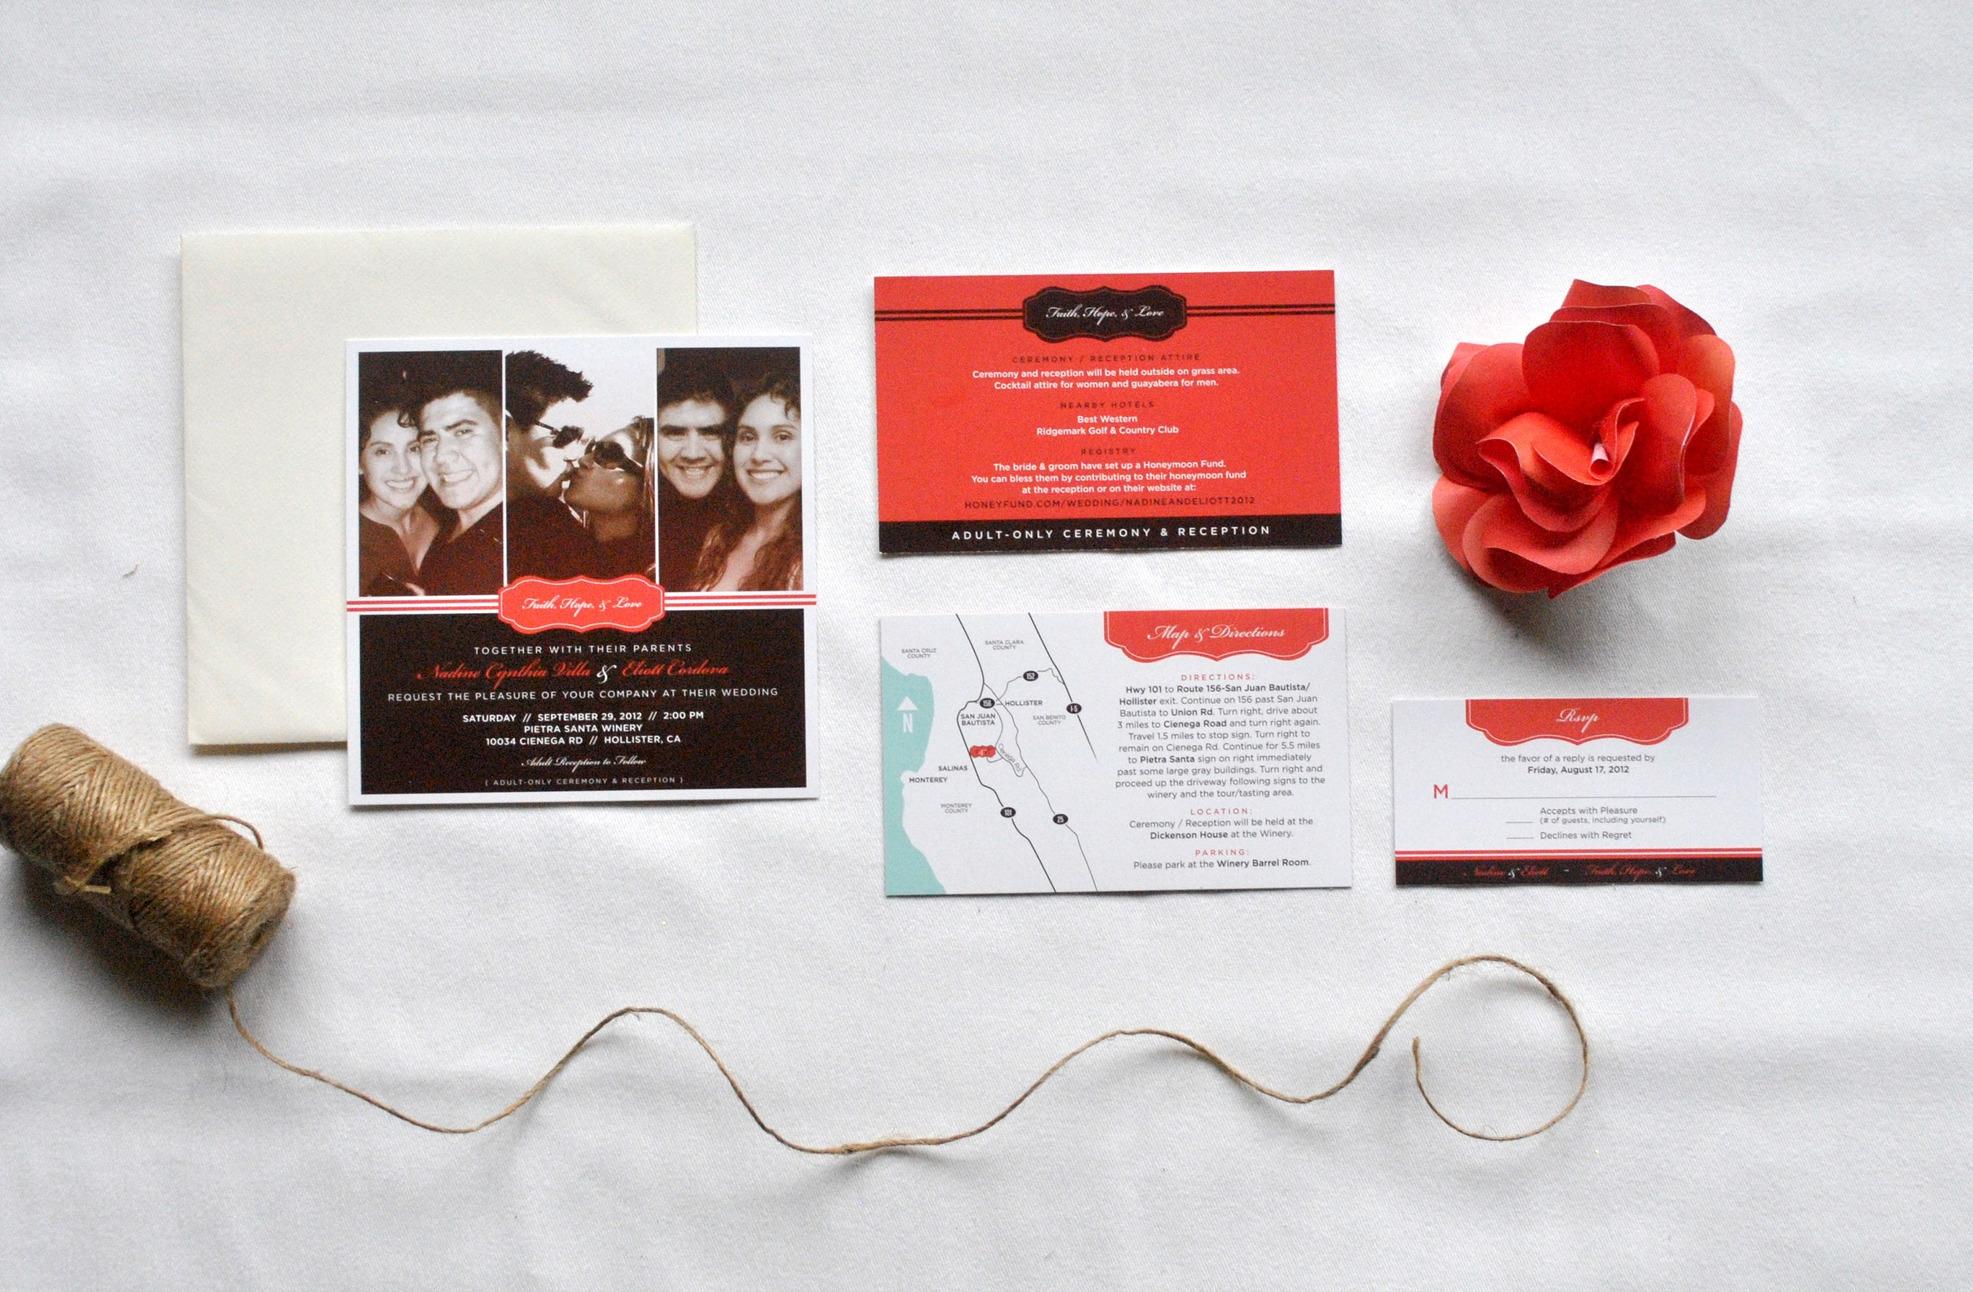 Nadine + Eliot Wedding Invitation